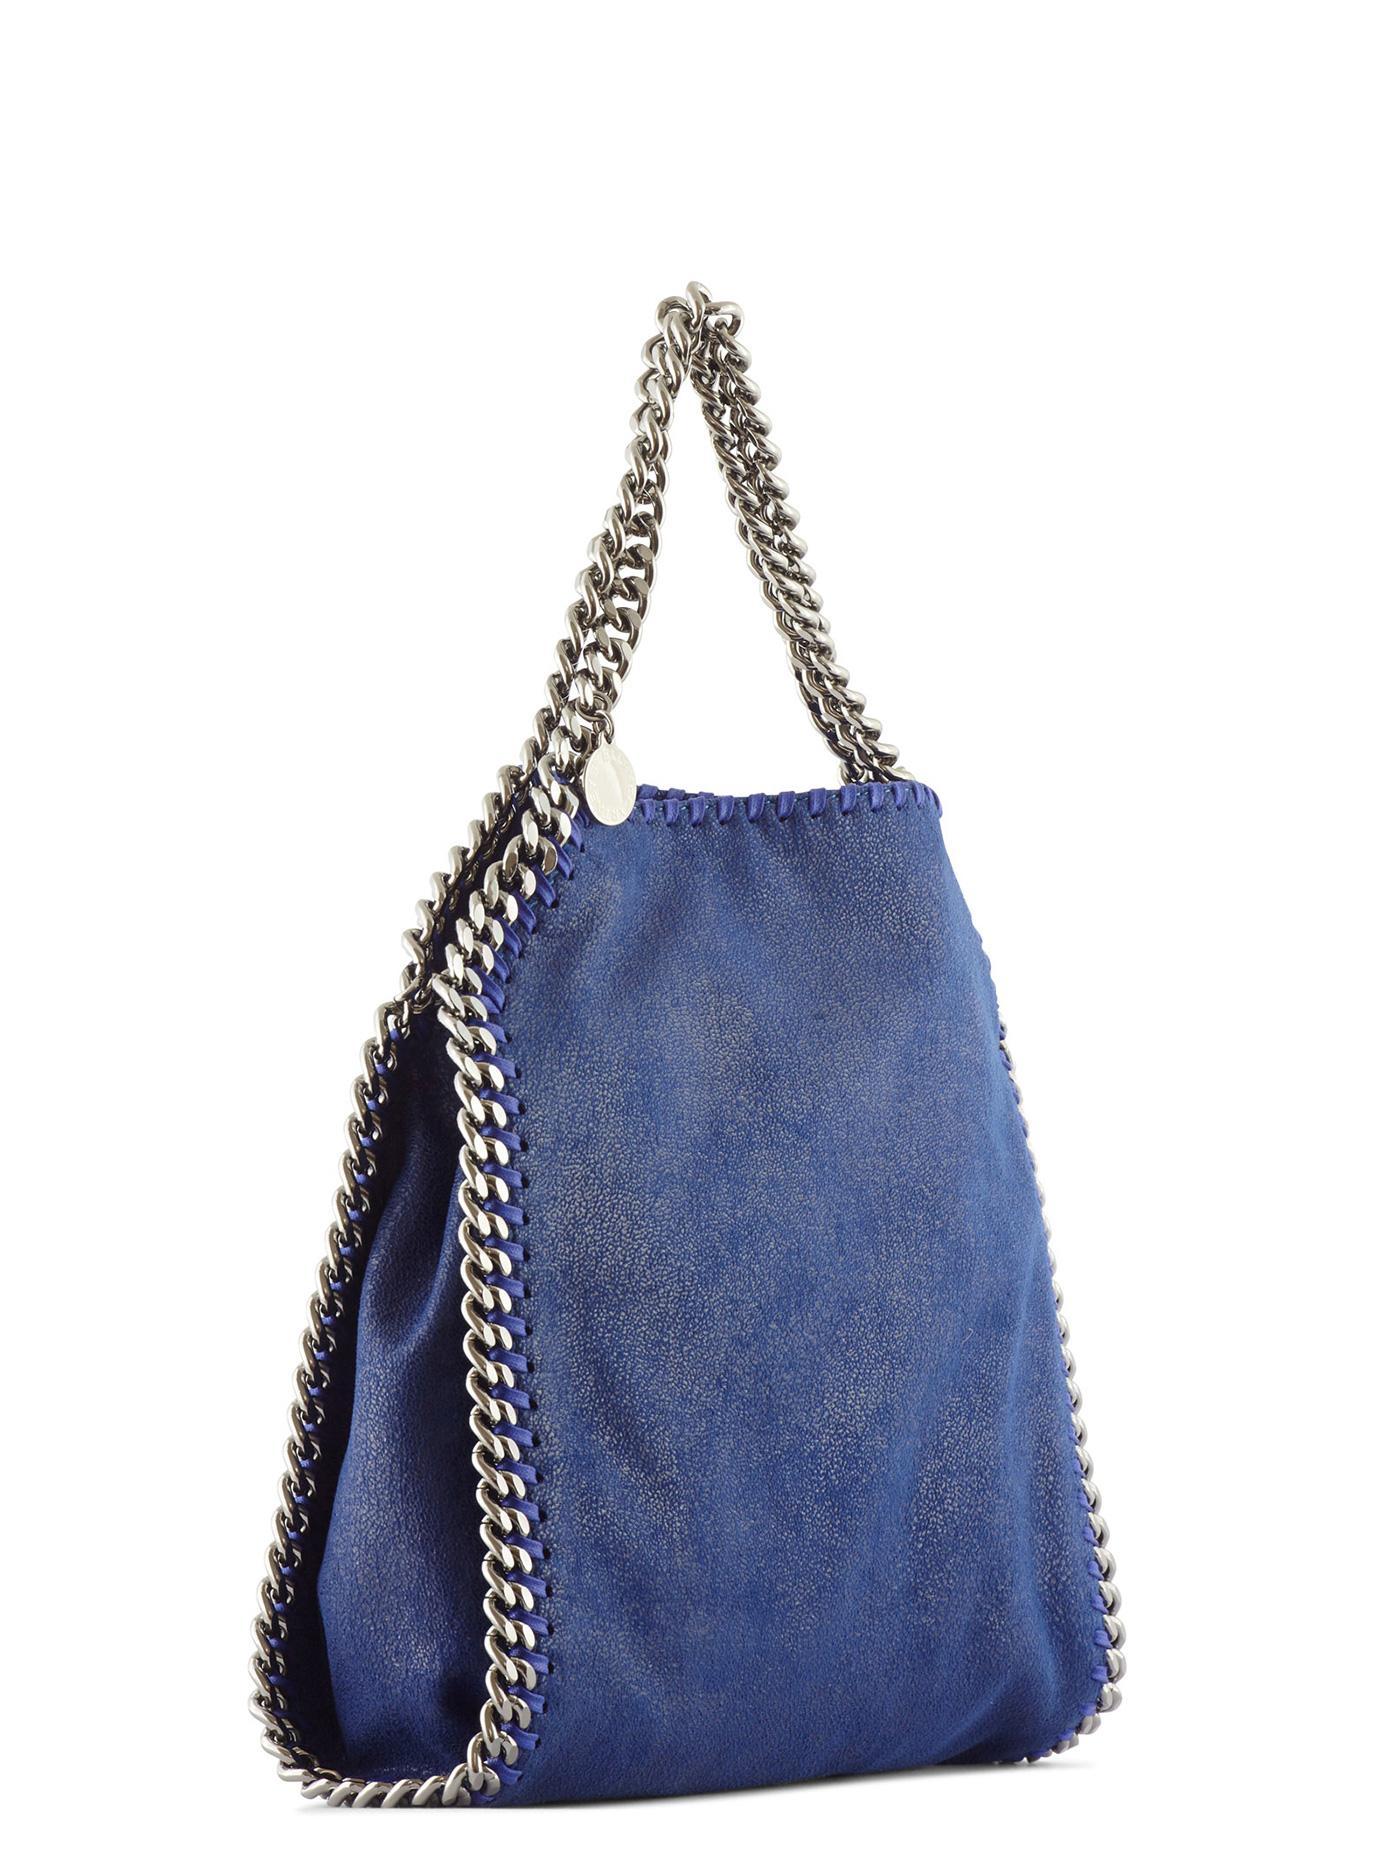 Stella Mccartney Bag London. Lyst - Stella Mccartney Mini Falabella Faux ... 0bf5d647b6cd8